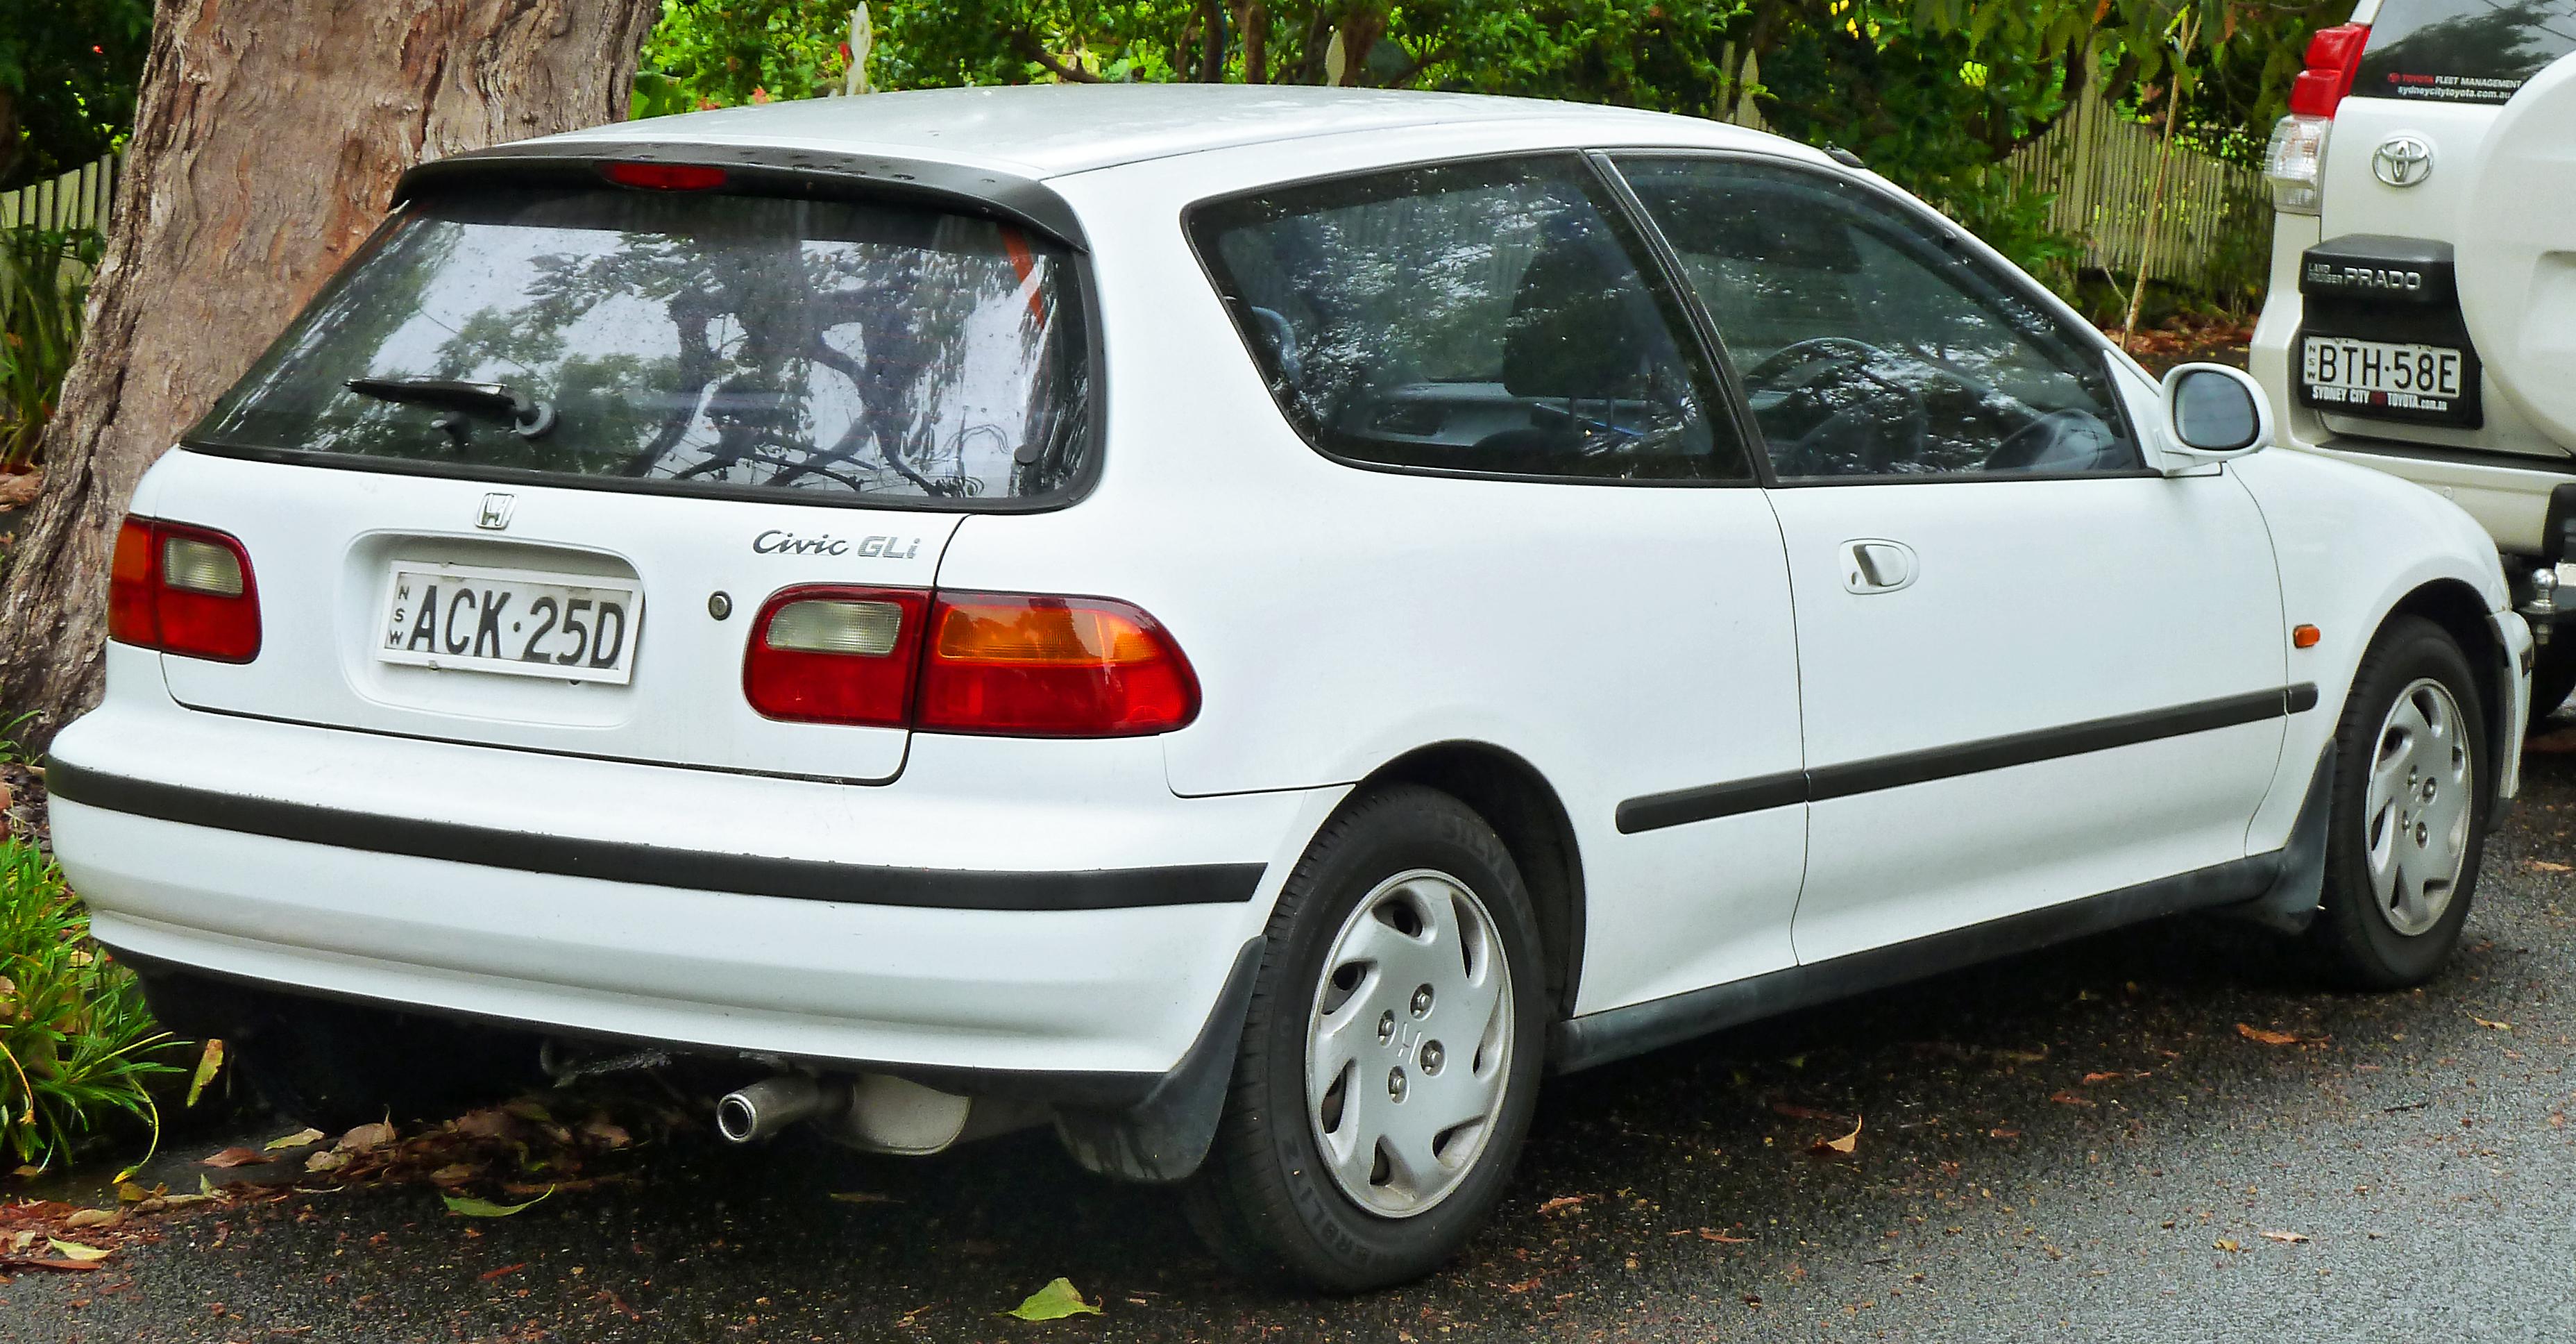 description 1993 1995 honda civic gli 3 door hatchback 2011 11 17 02